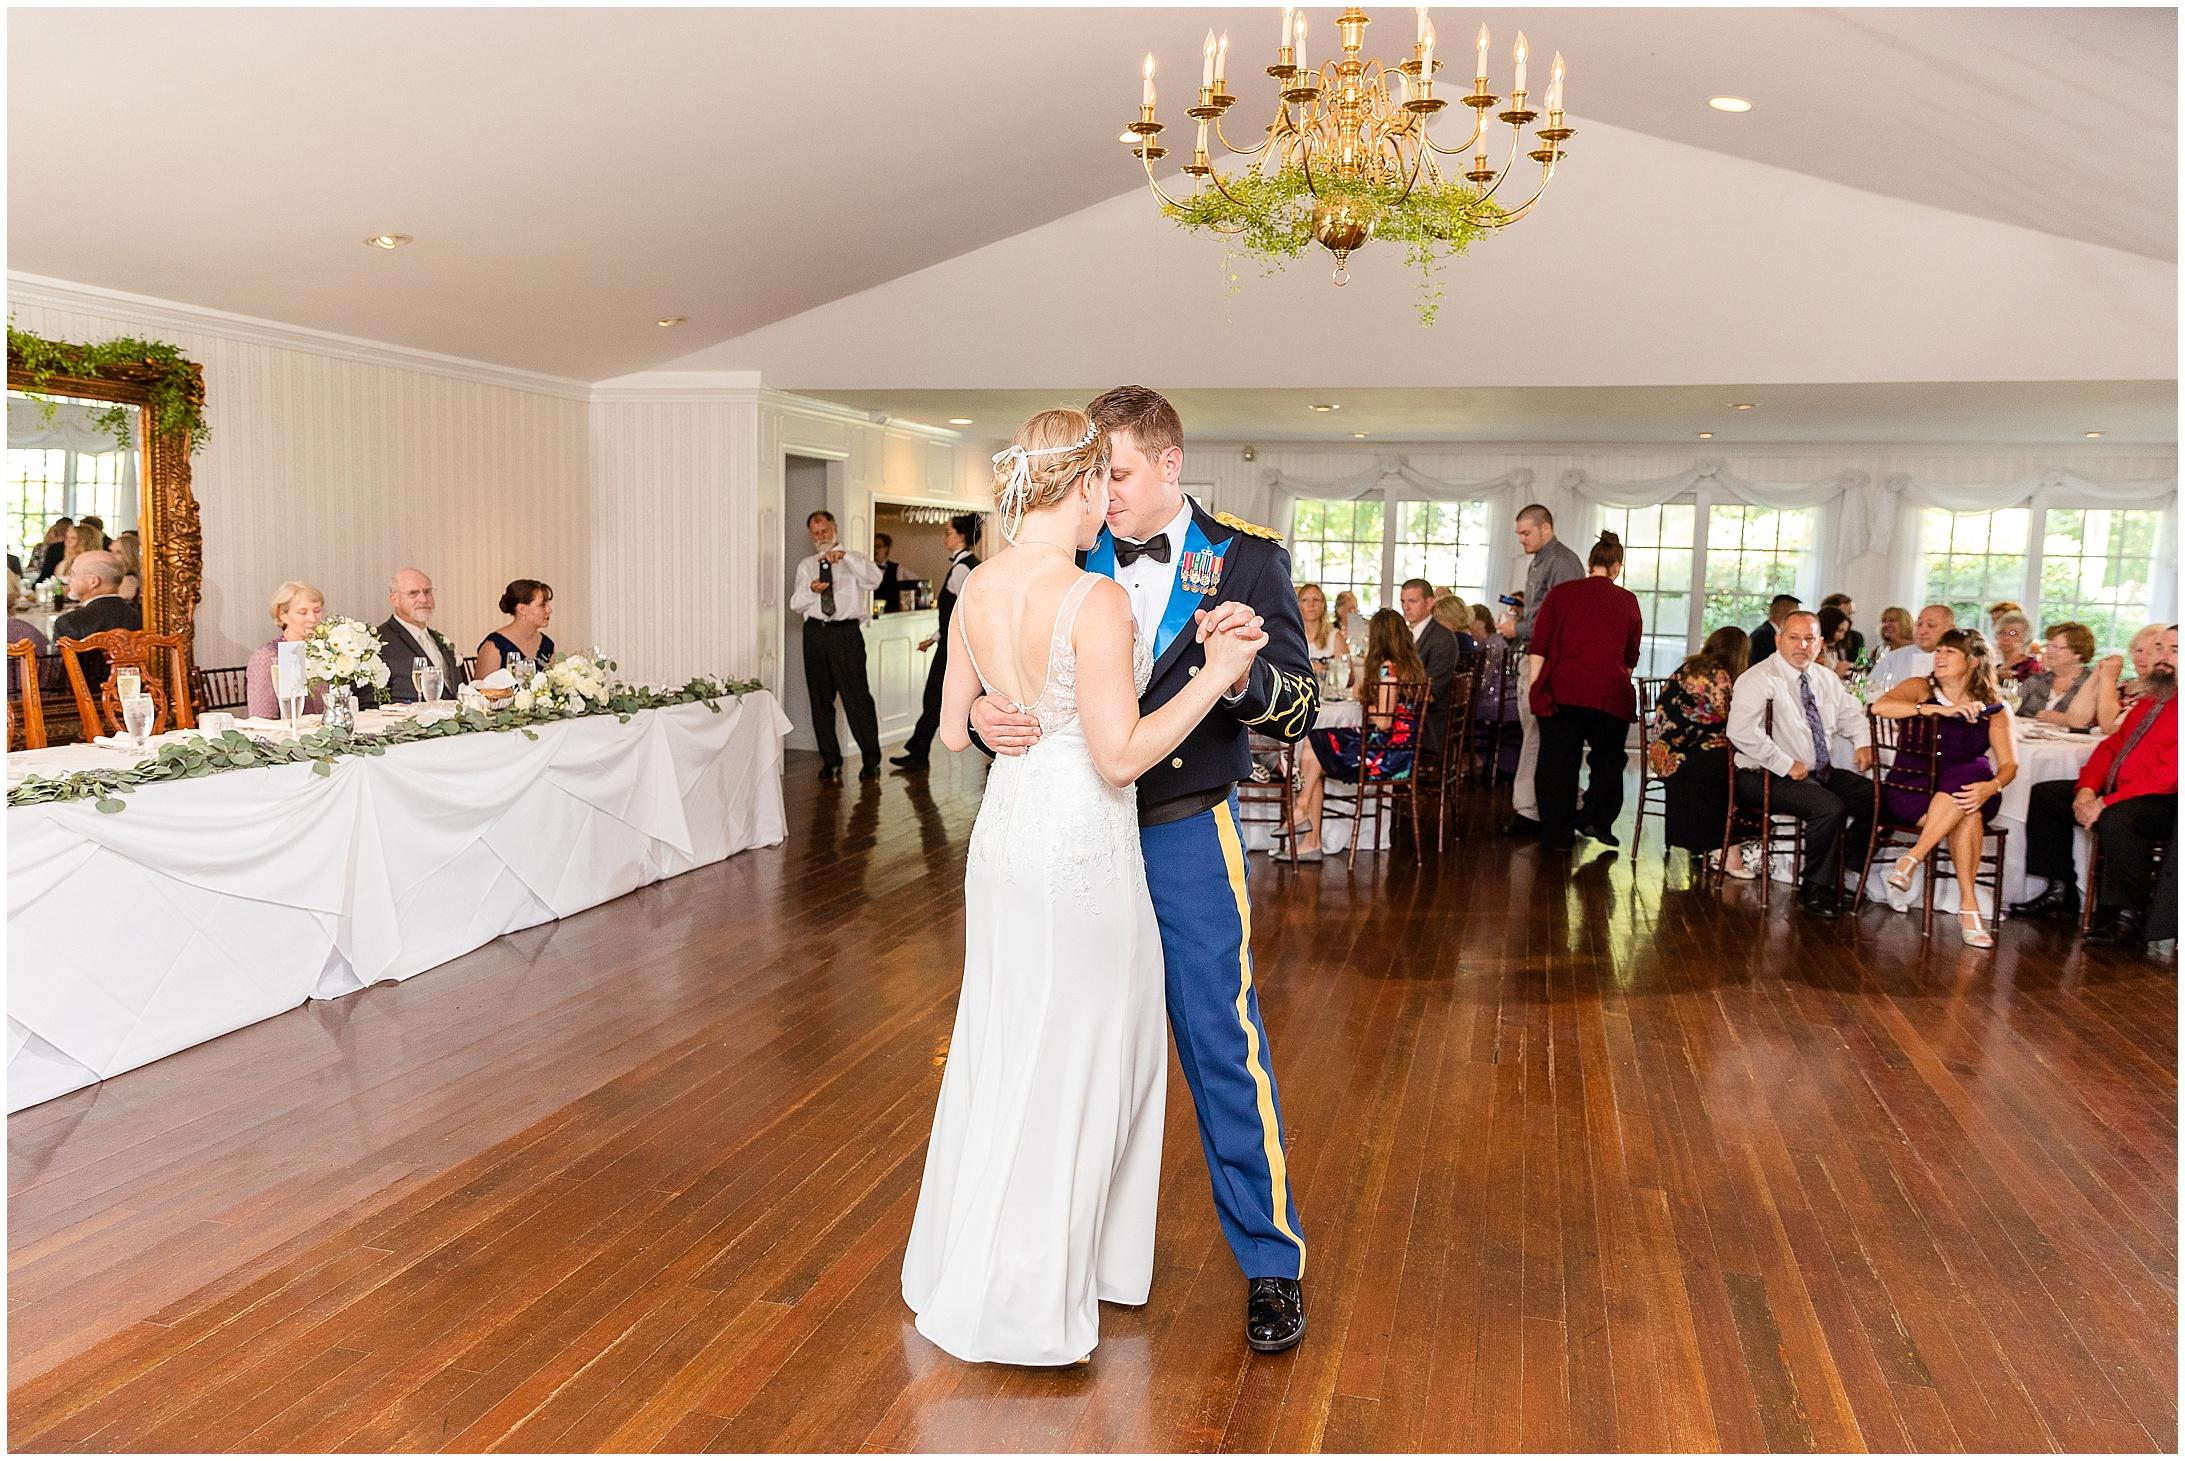 Antrim-1844-wedding-photos_0468.jpg